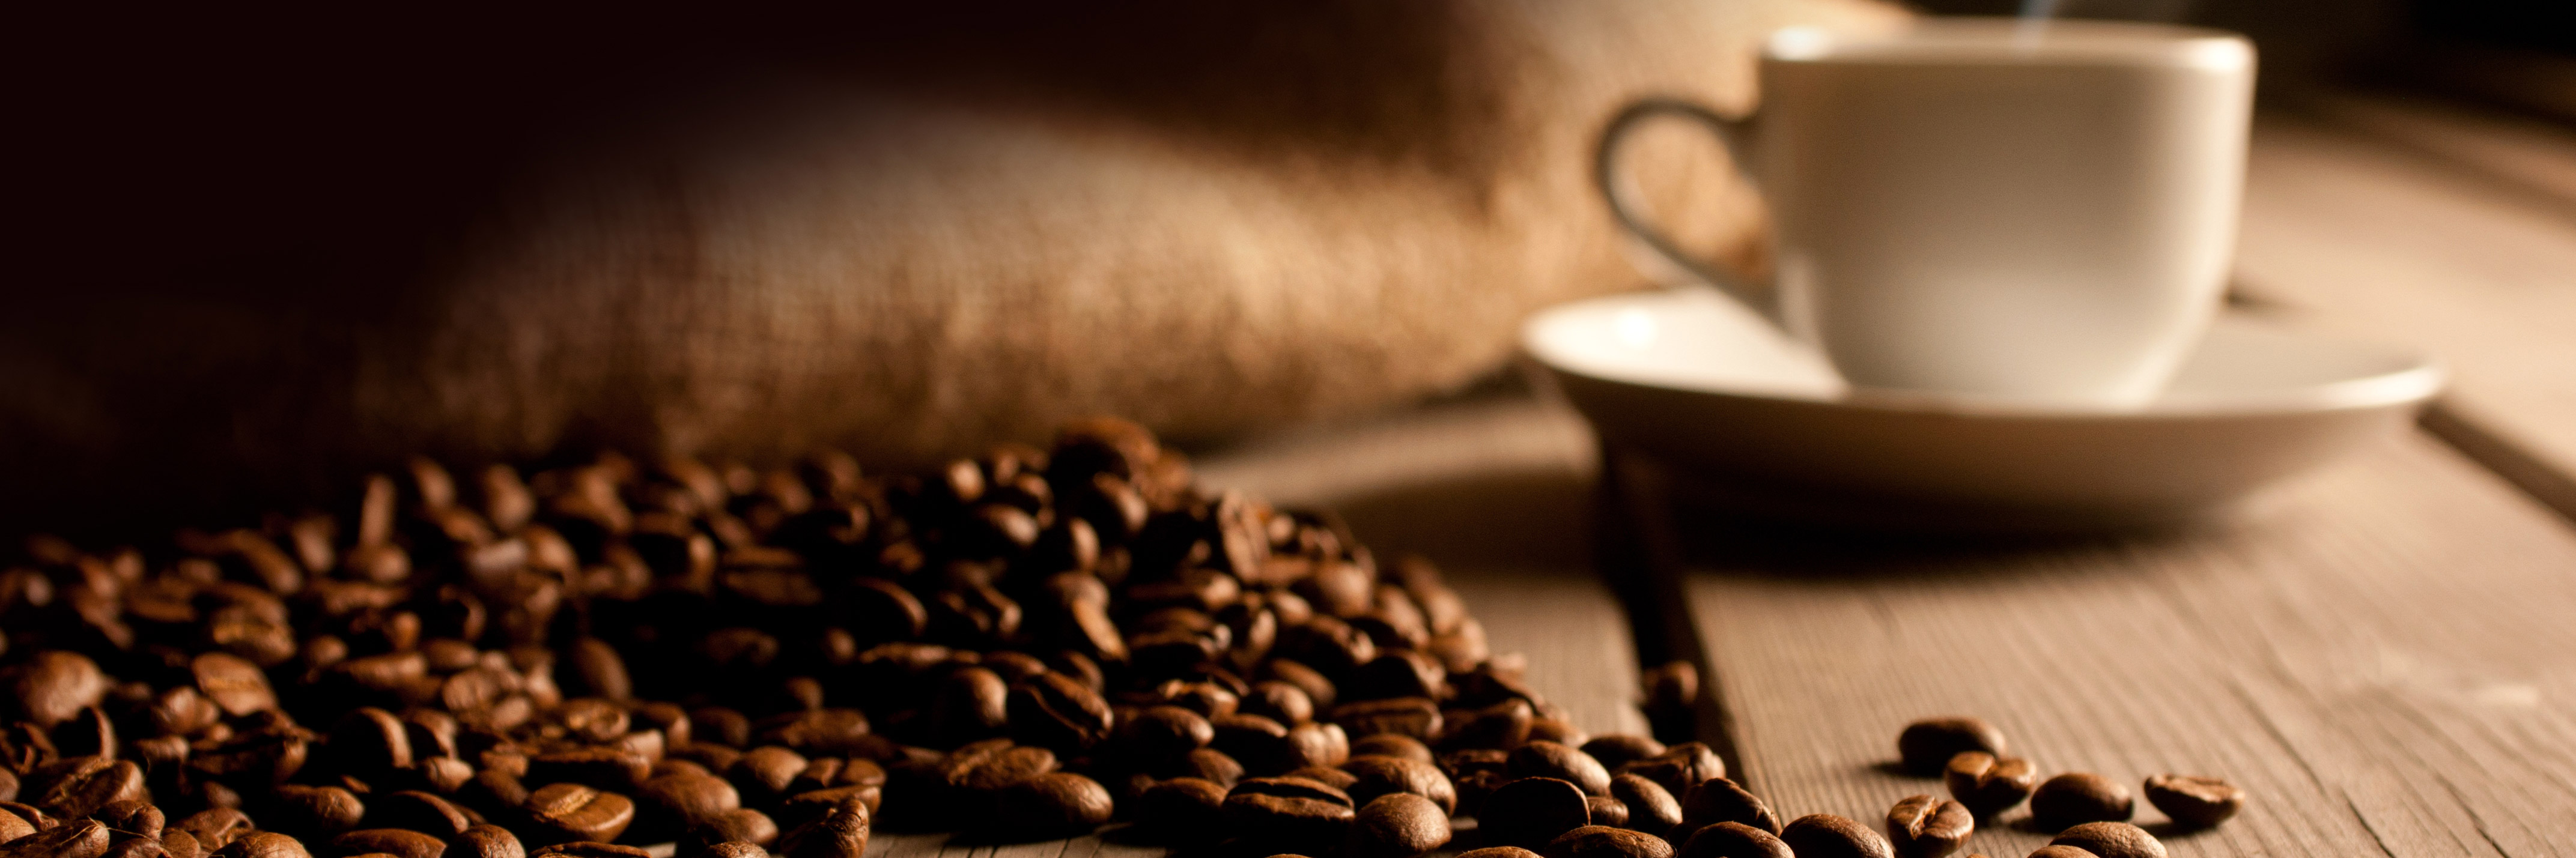 caffe-grani-tazzina